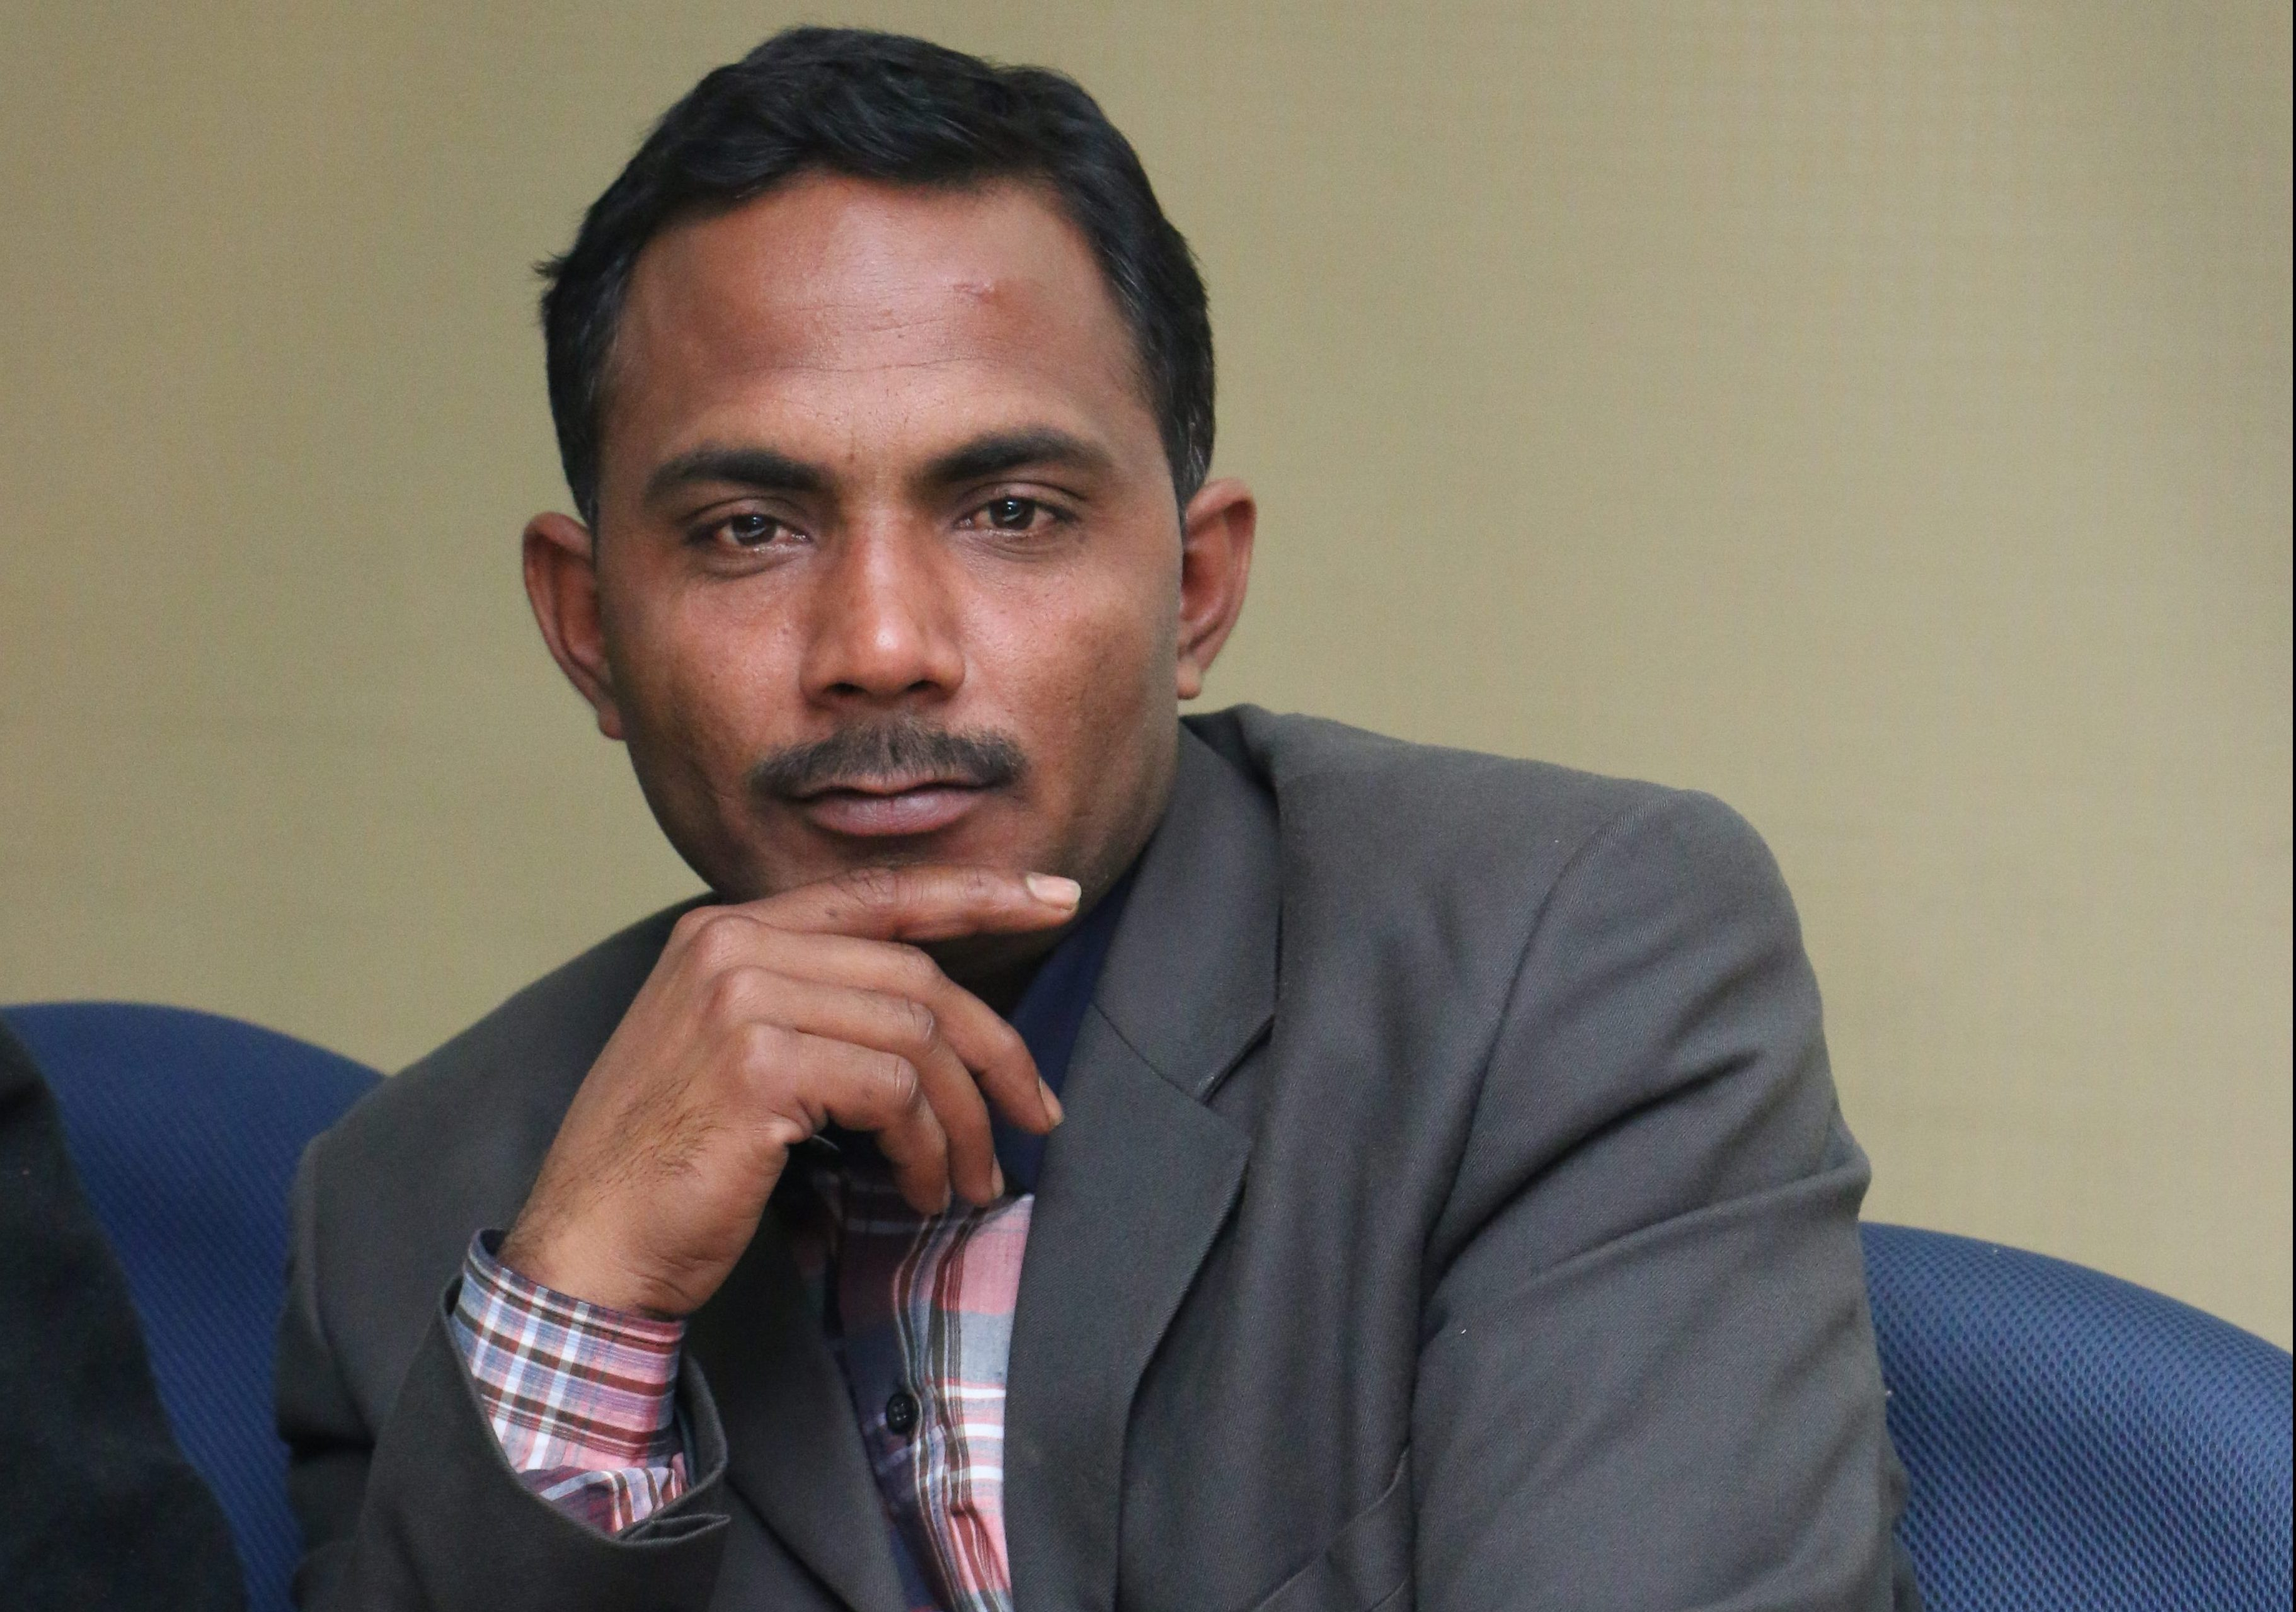 Muhammad Safdar - Senior Supervisor Residential Services